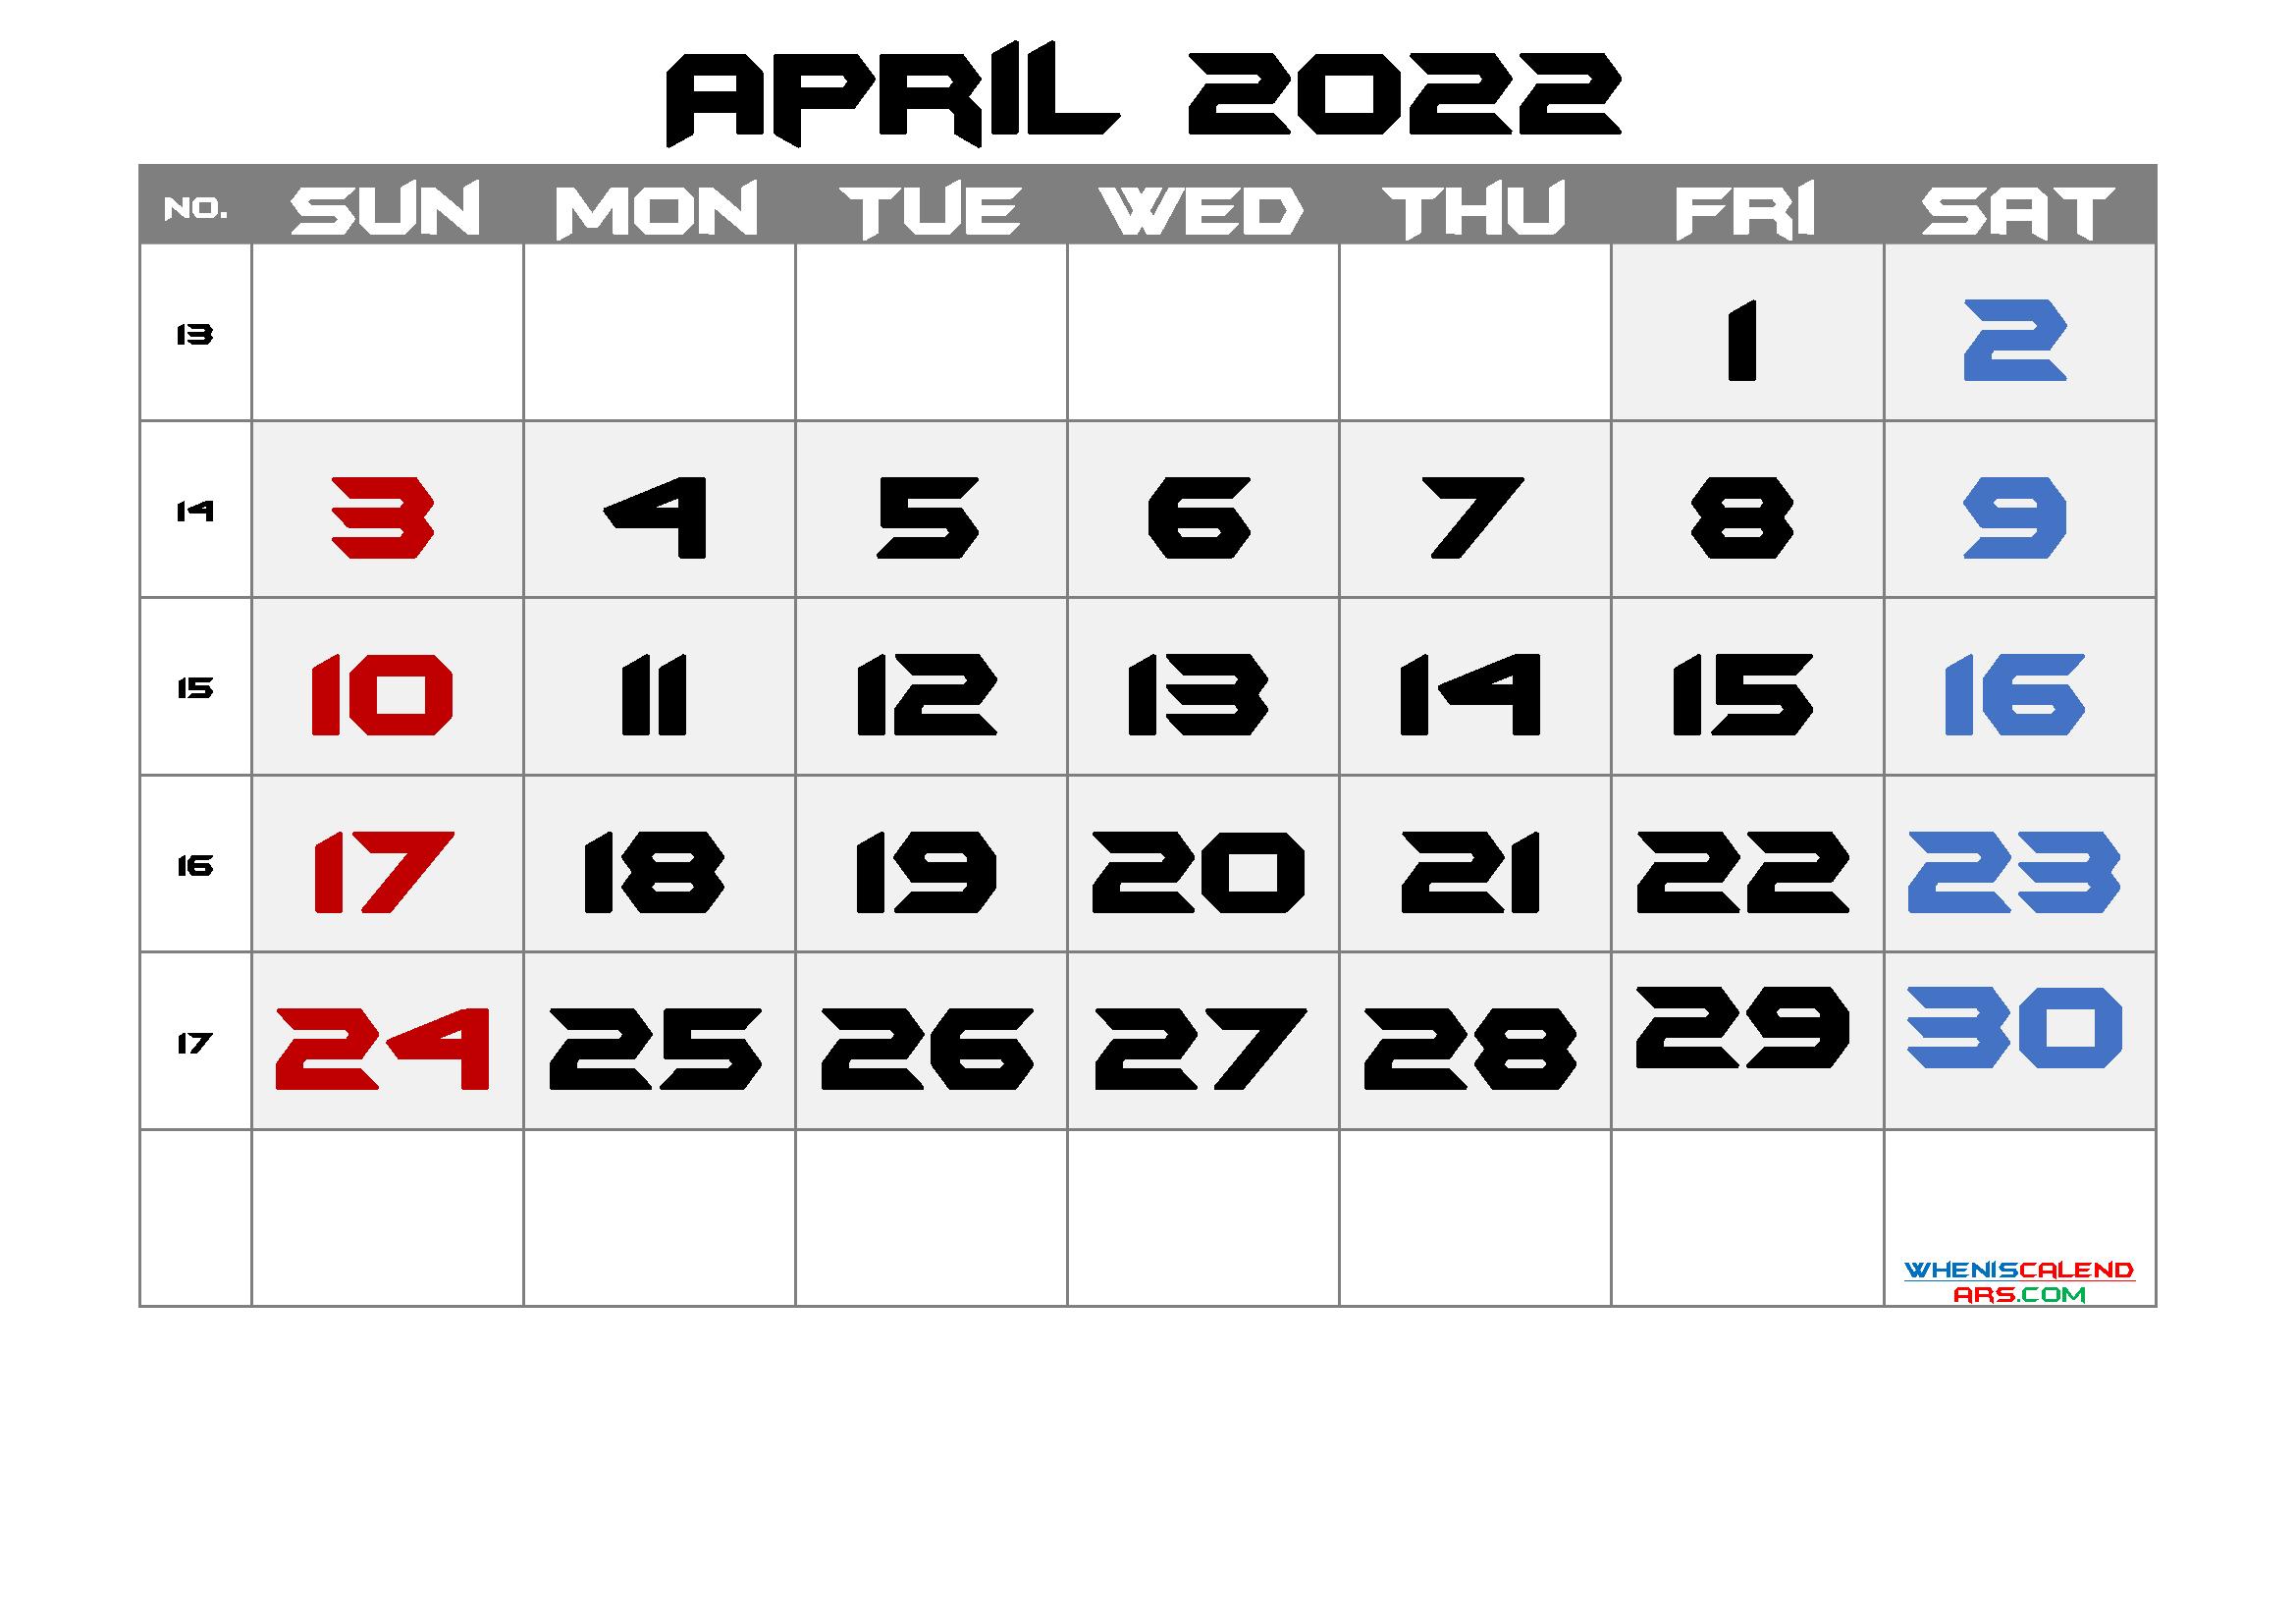 Free Printable Calendar April 2021 2022 And 2023 And More inside April Monthly Calendar 2022 Free Printable Photo